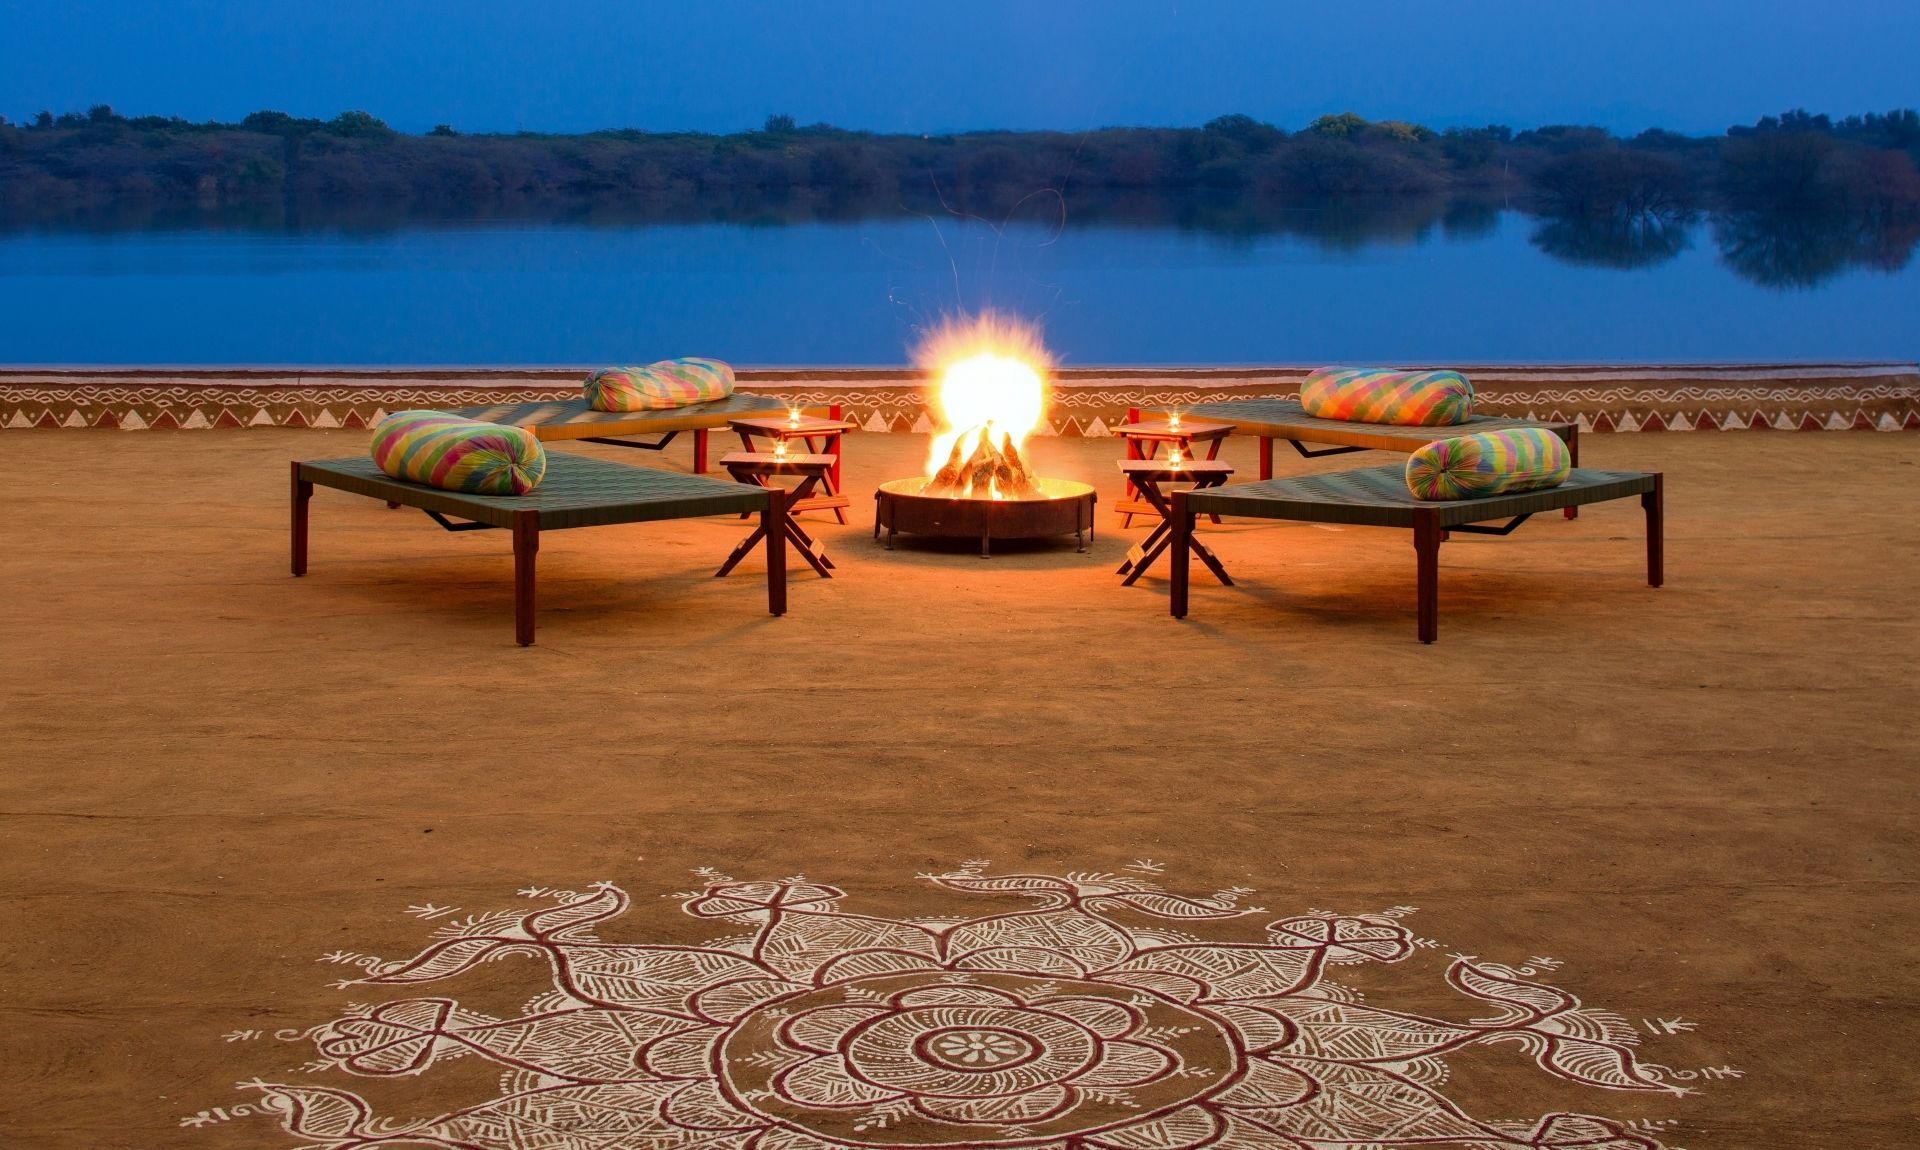 RAAS Chhatrasagar – evening comfort